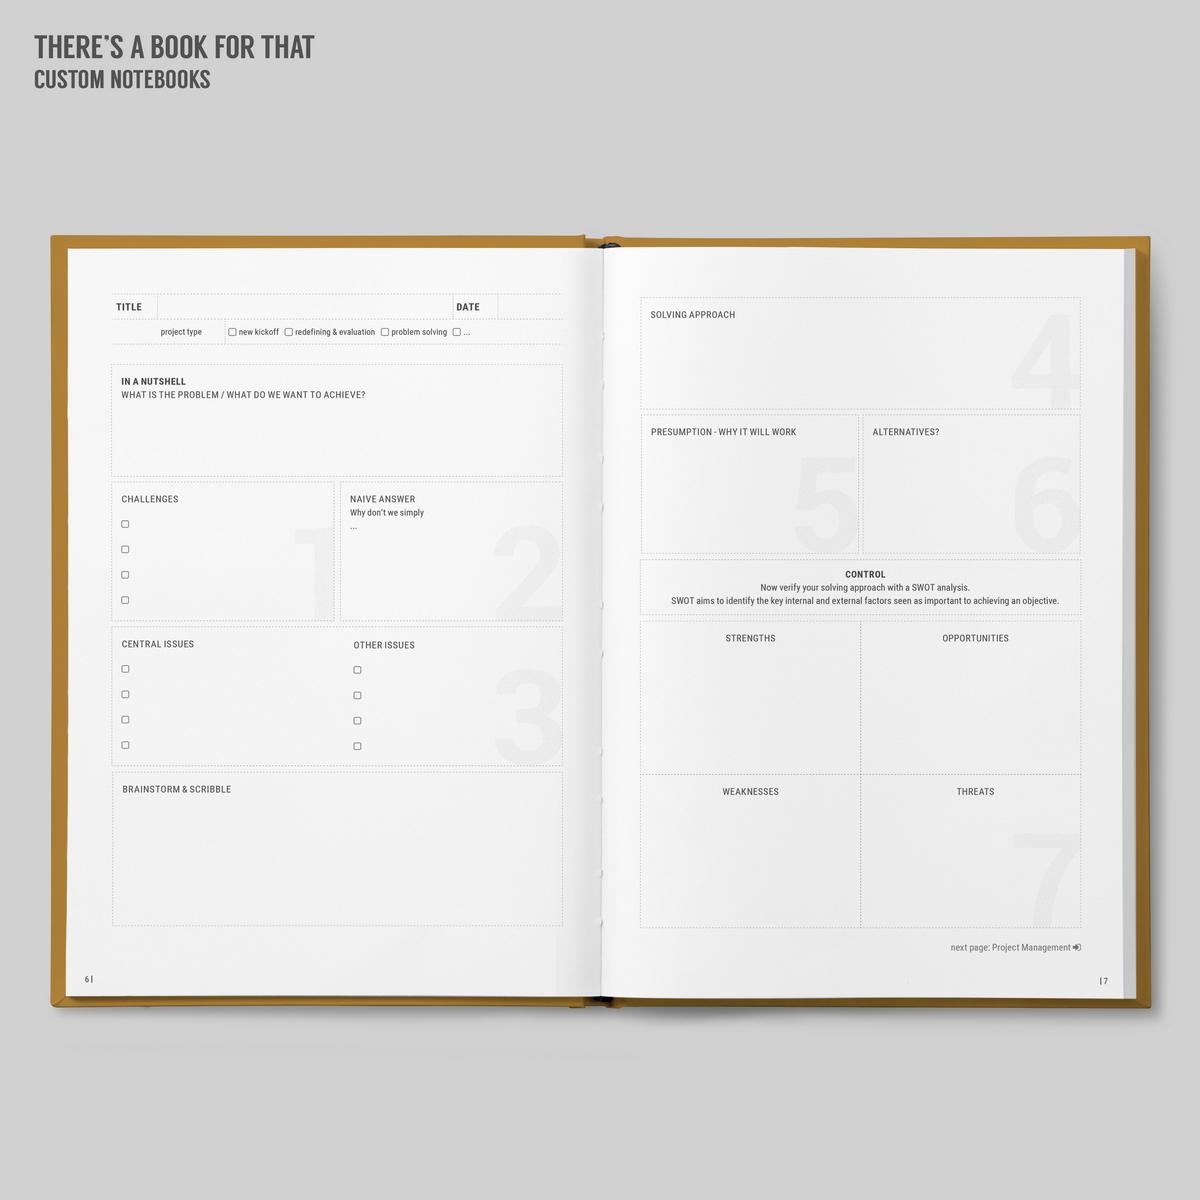 Projectmanagment_amazon-Projectmanagement Notebook_Stationery_bleed